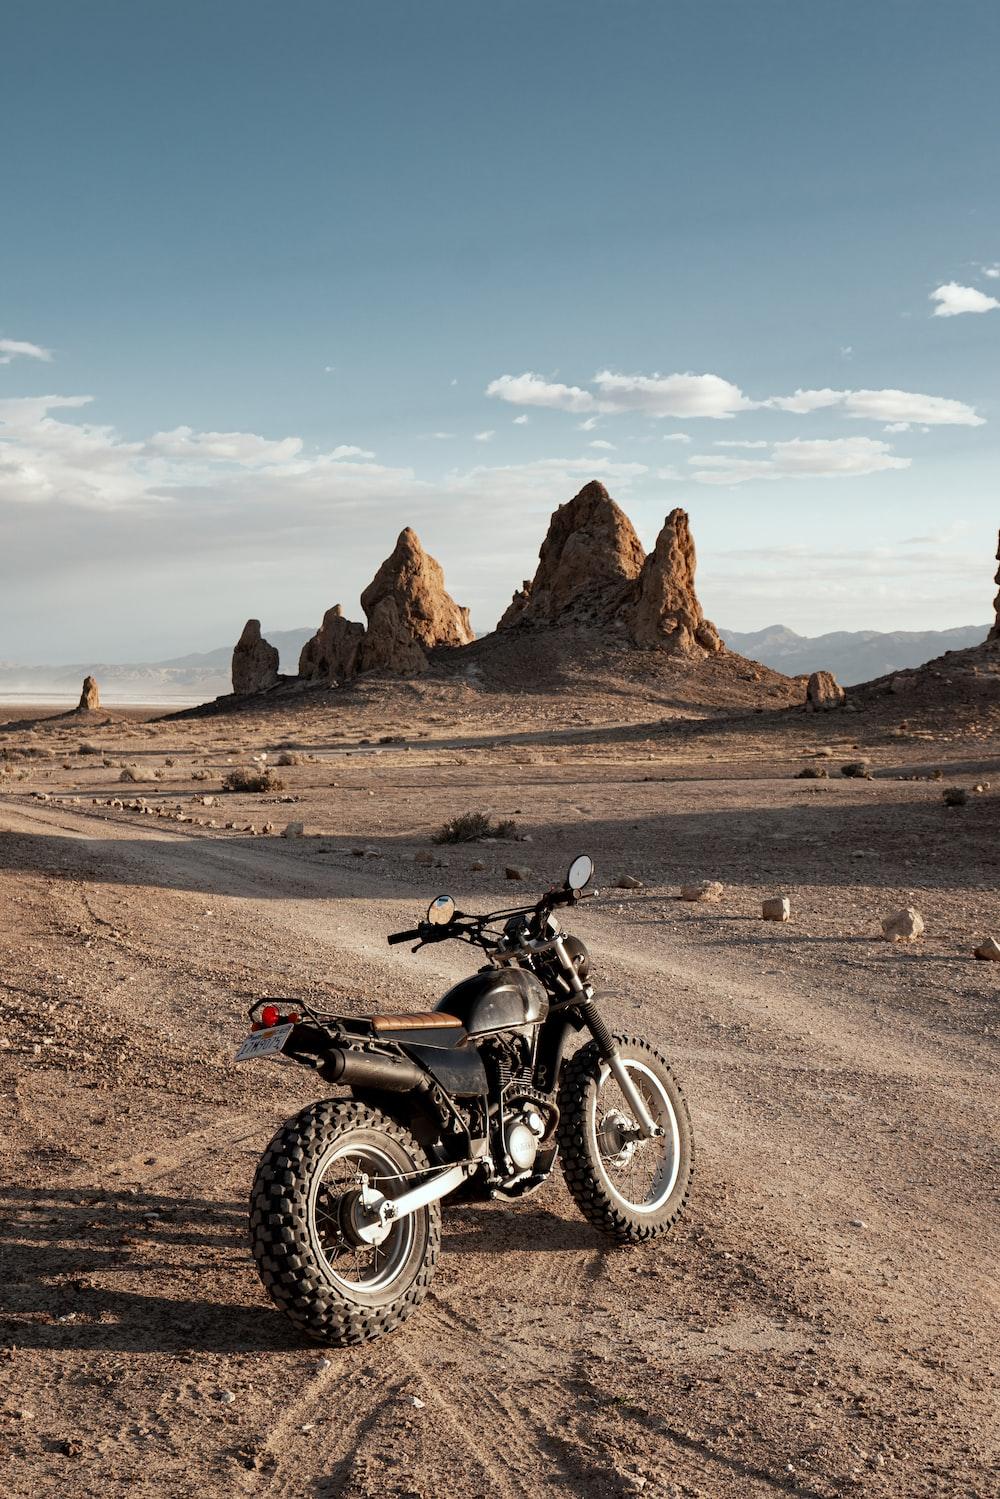 black motorcycle on brown dirt road during daytime